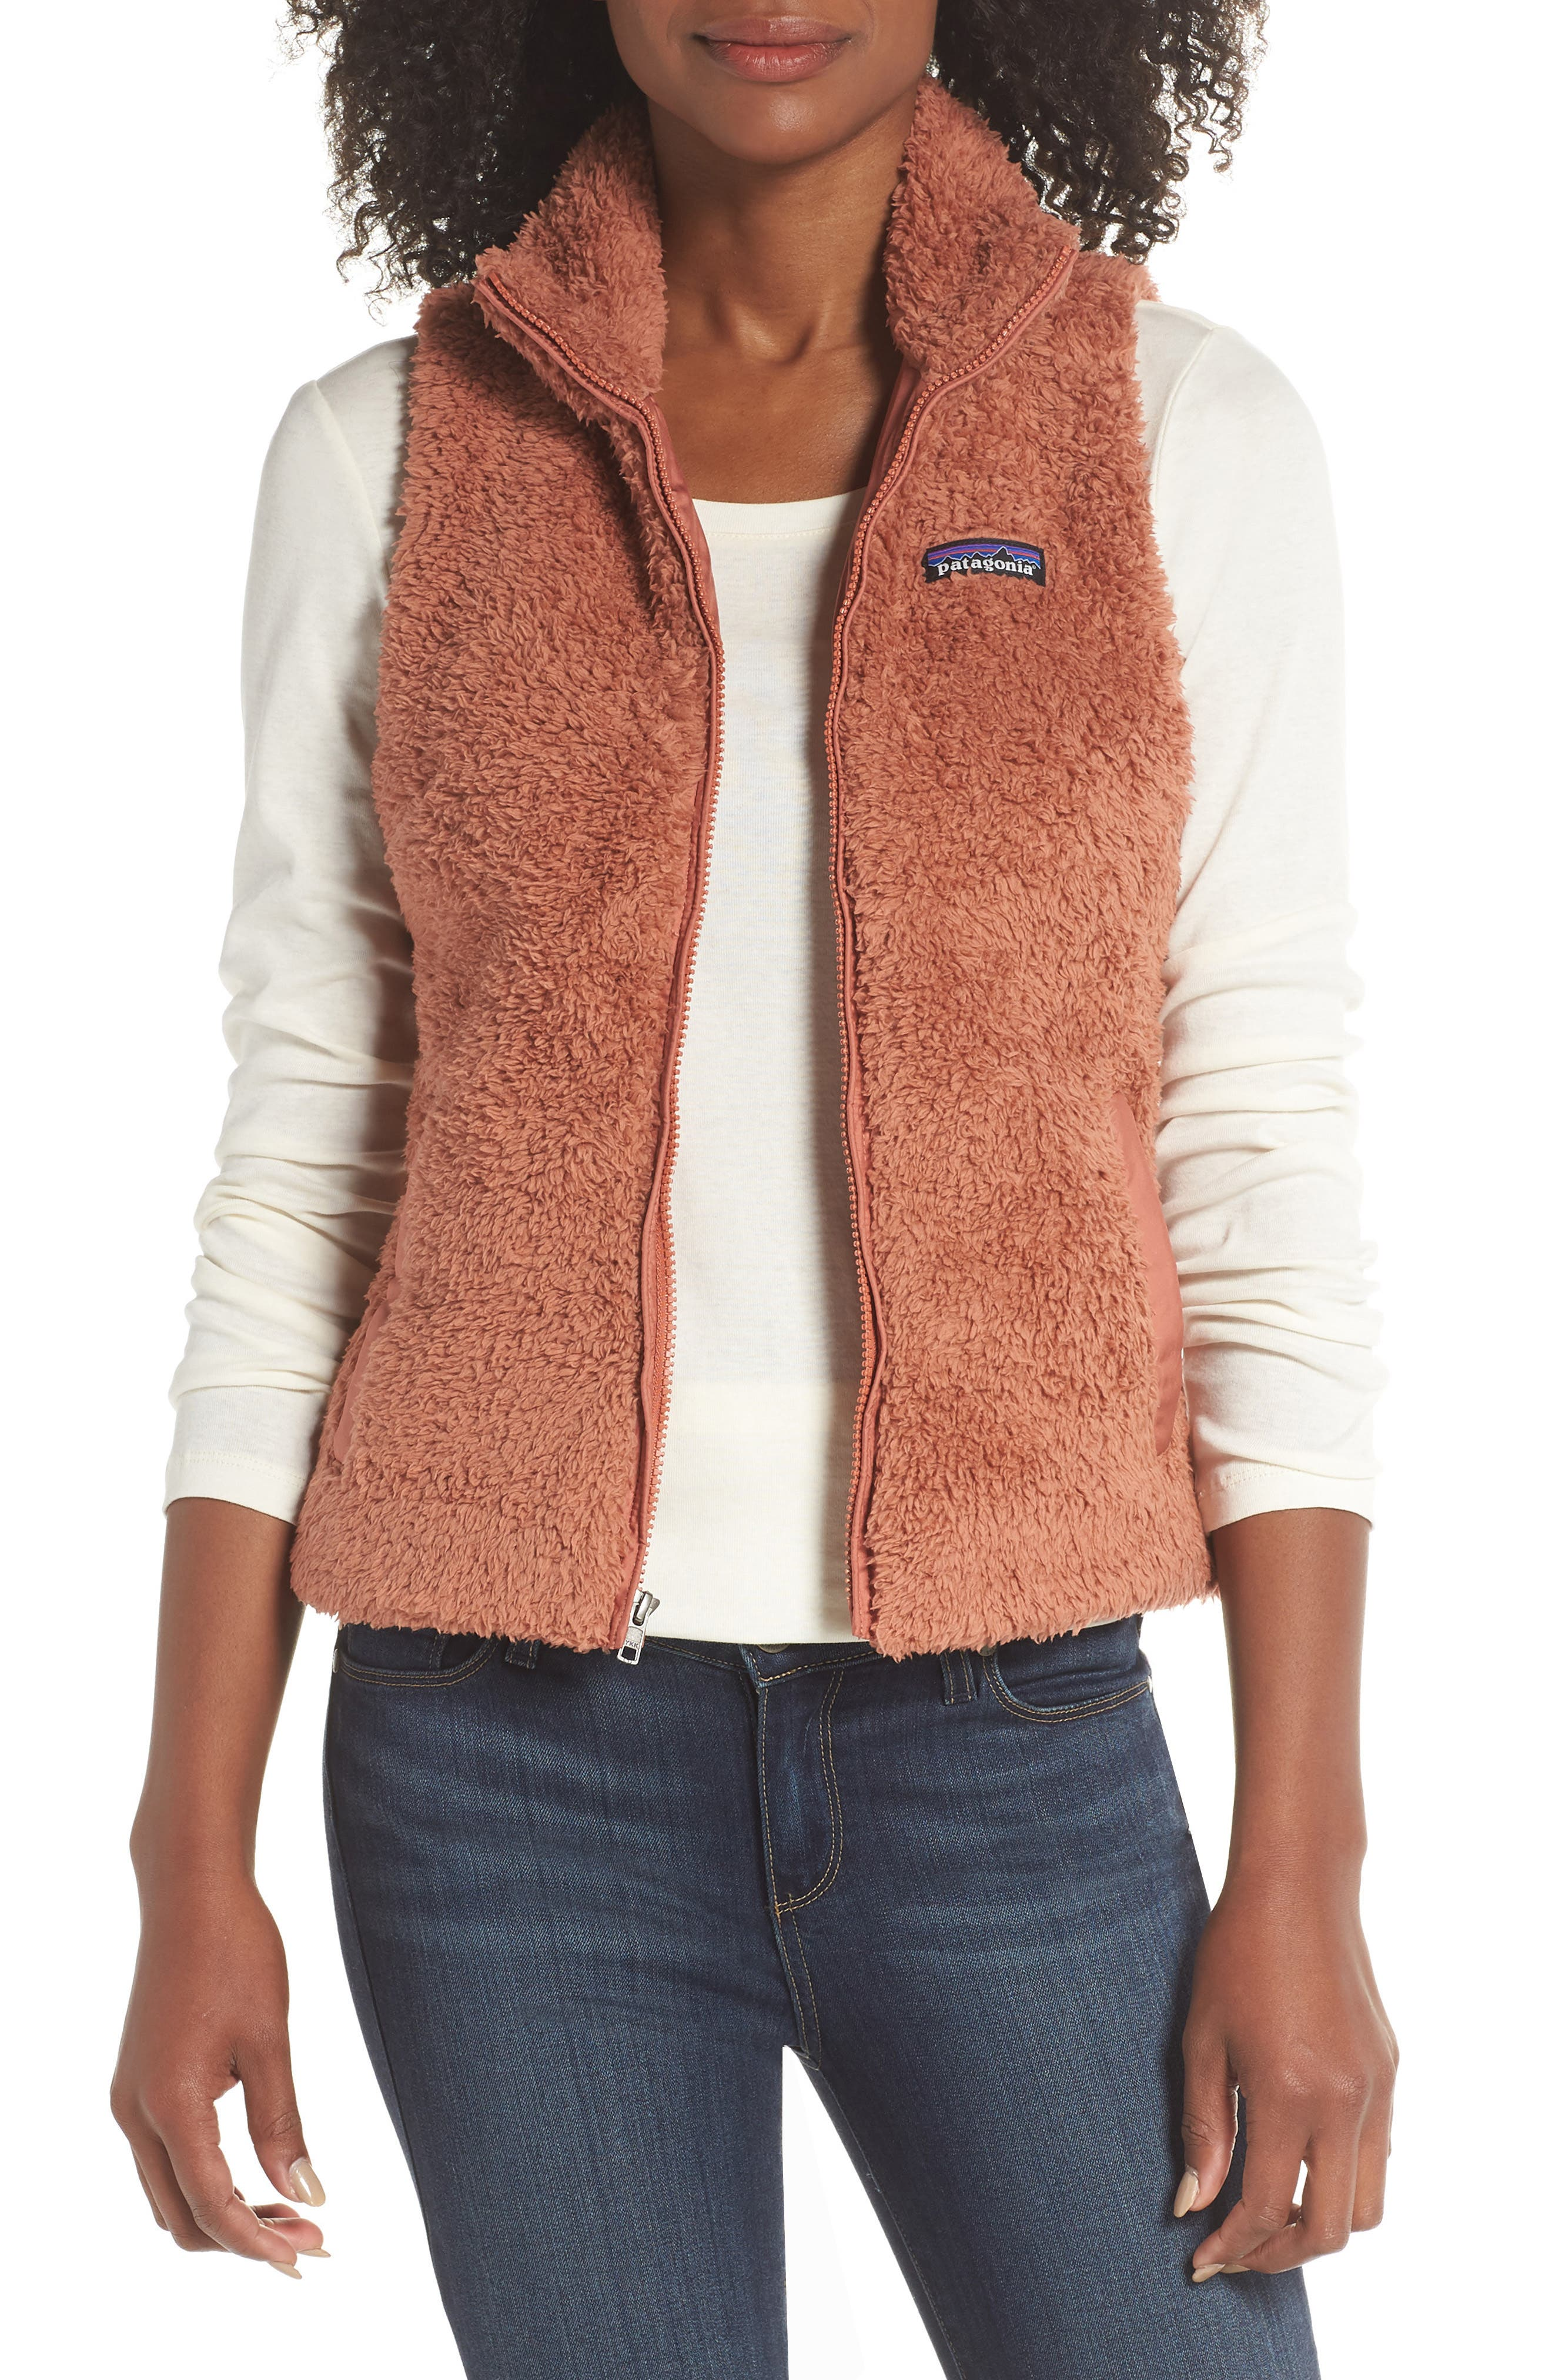 Patagonia fleece zip up jacket